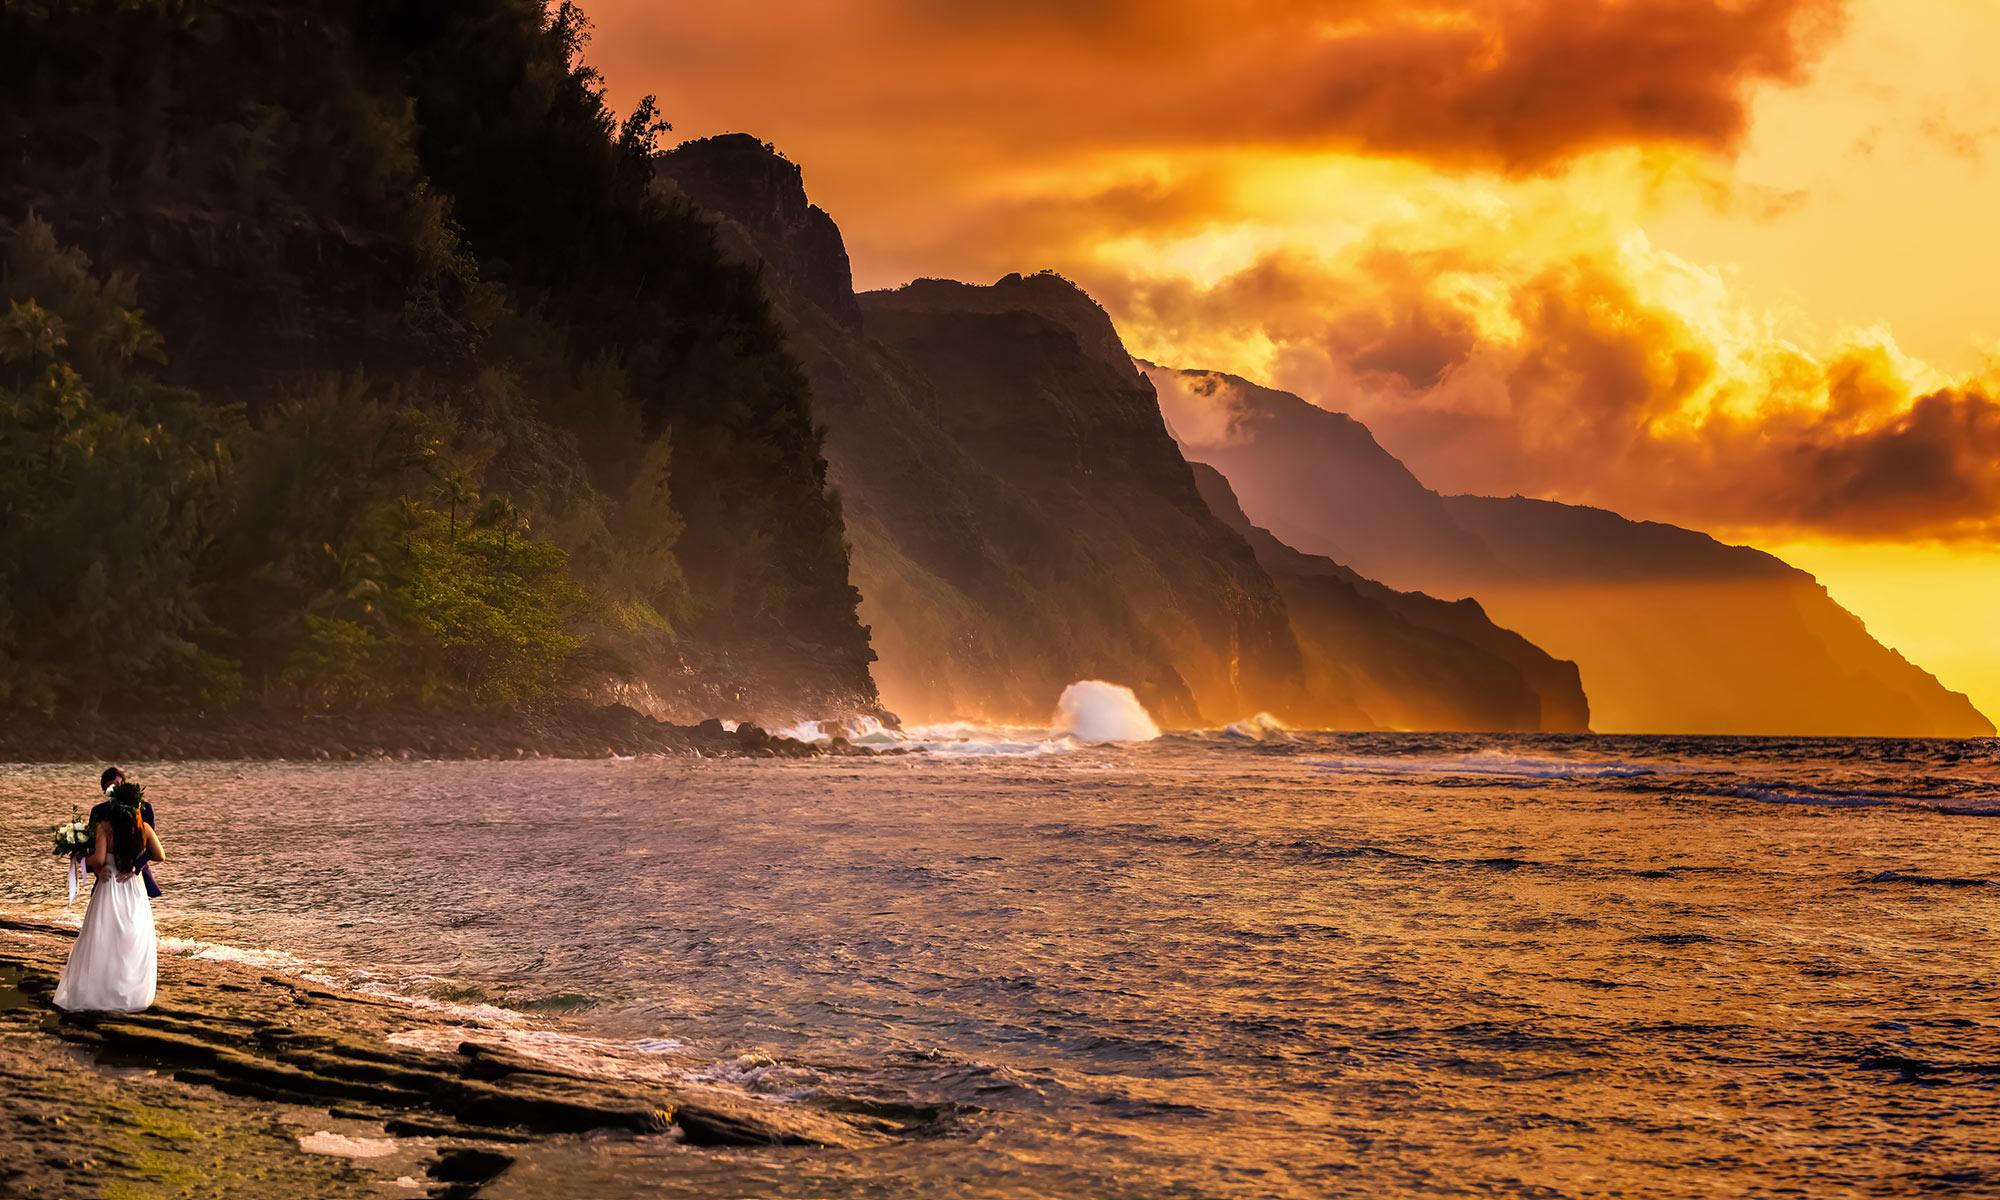 Hawaiian Sunset - Bride & Groom - Wedding Video Fisheye Studio - Irvine, CA